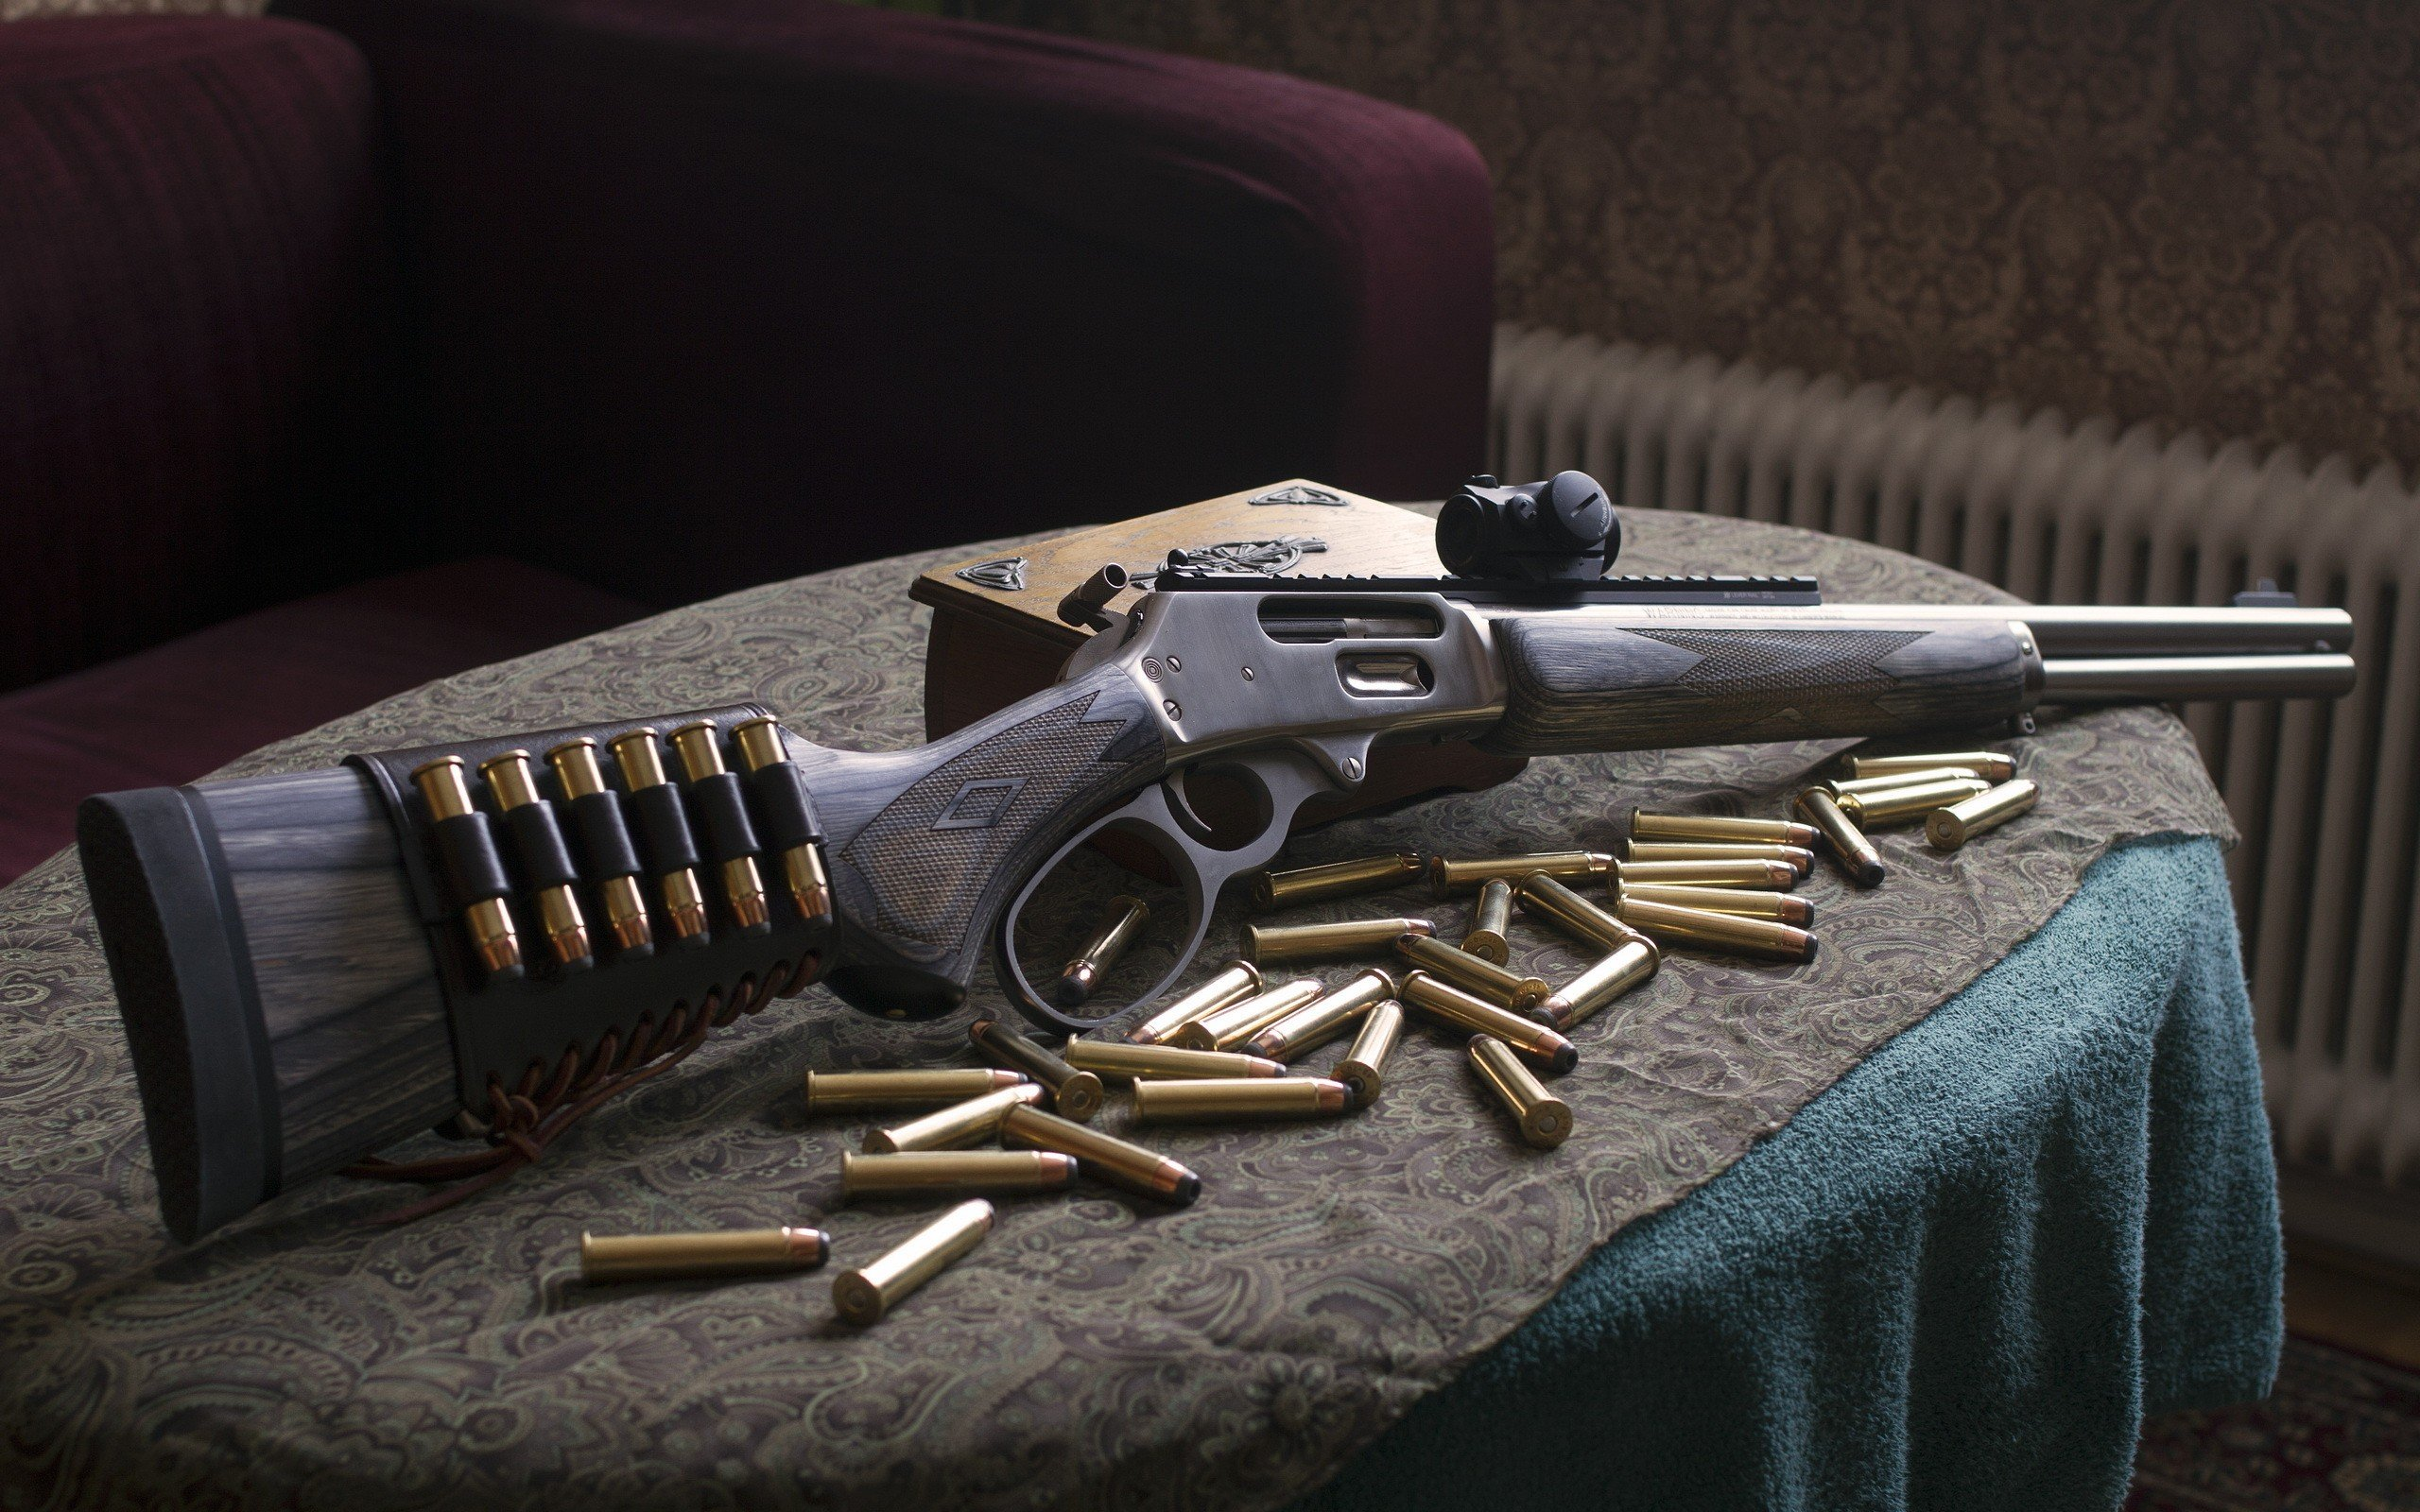 MARLIN hunting rifle weapon gun wallpaper 2560x1600 519280 2560x1600